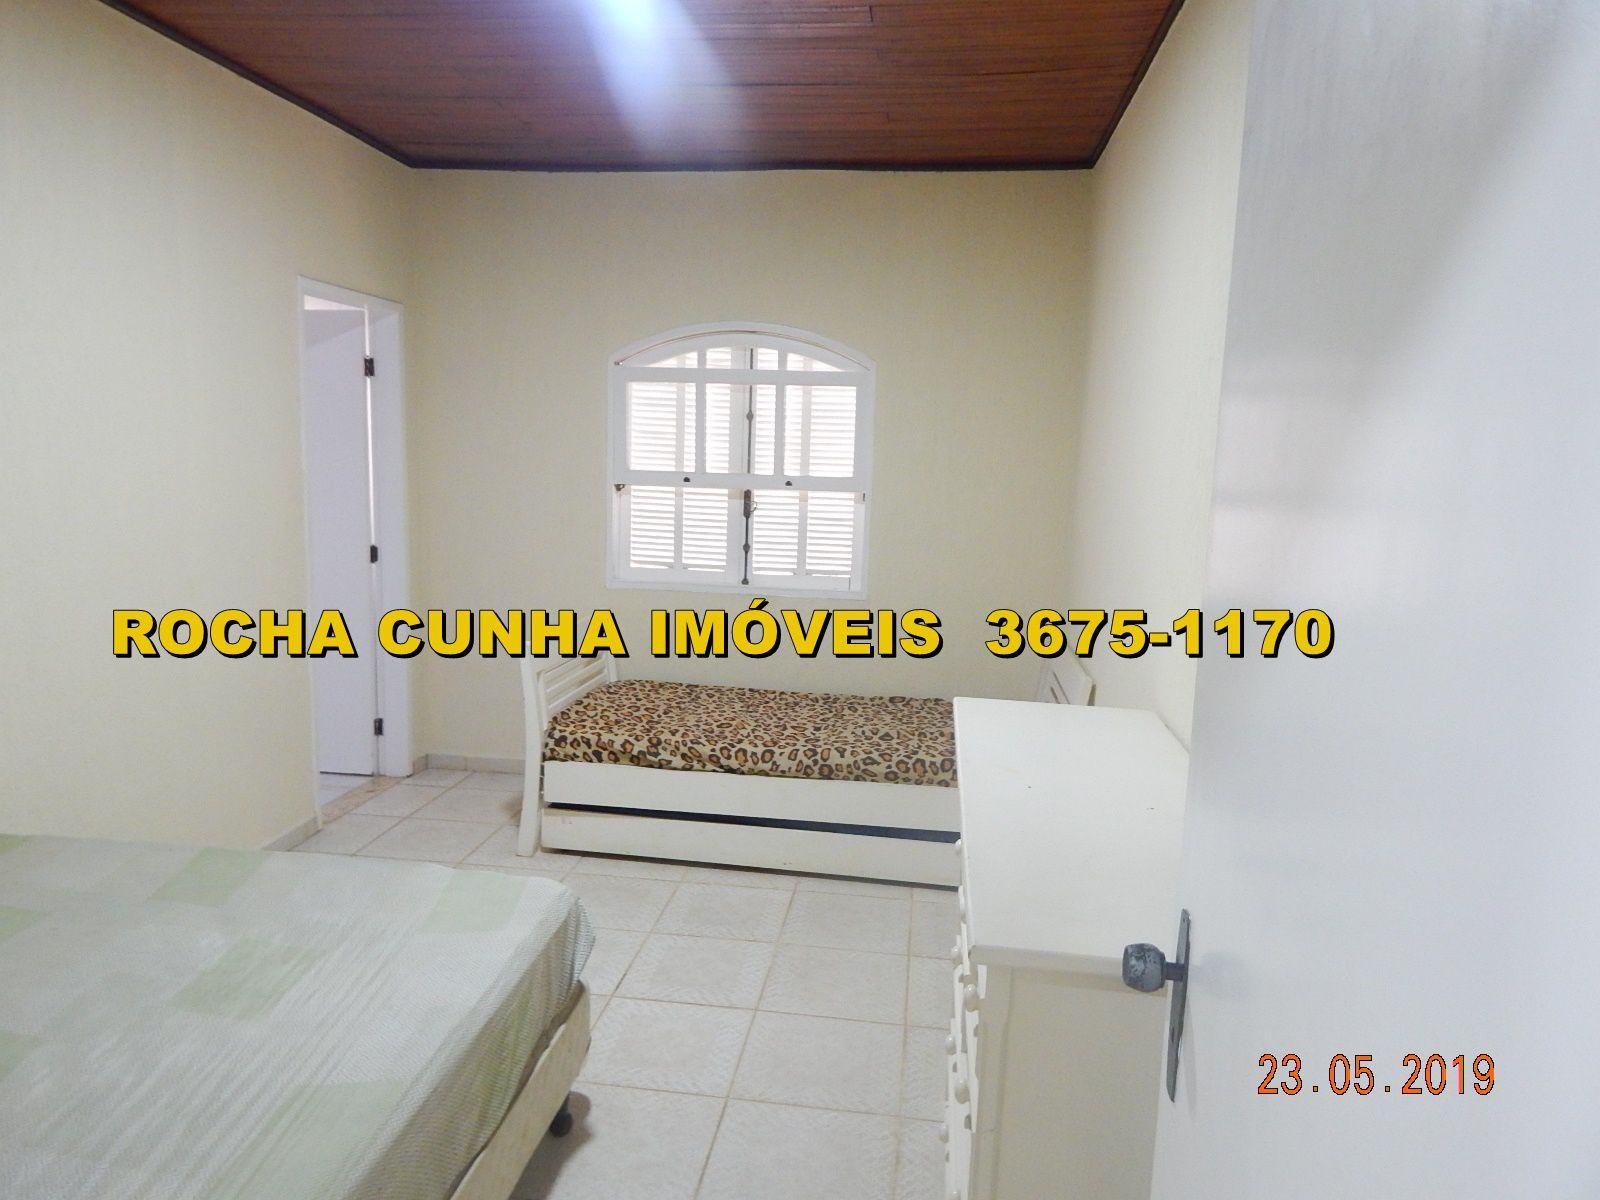 Chácara à venda Santana de Parnaíba,SP - R$ 780.000 - CHACARA0010 - 21